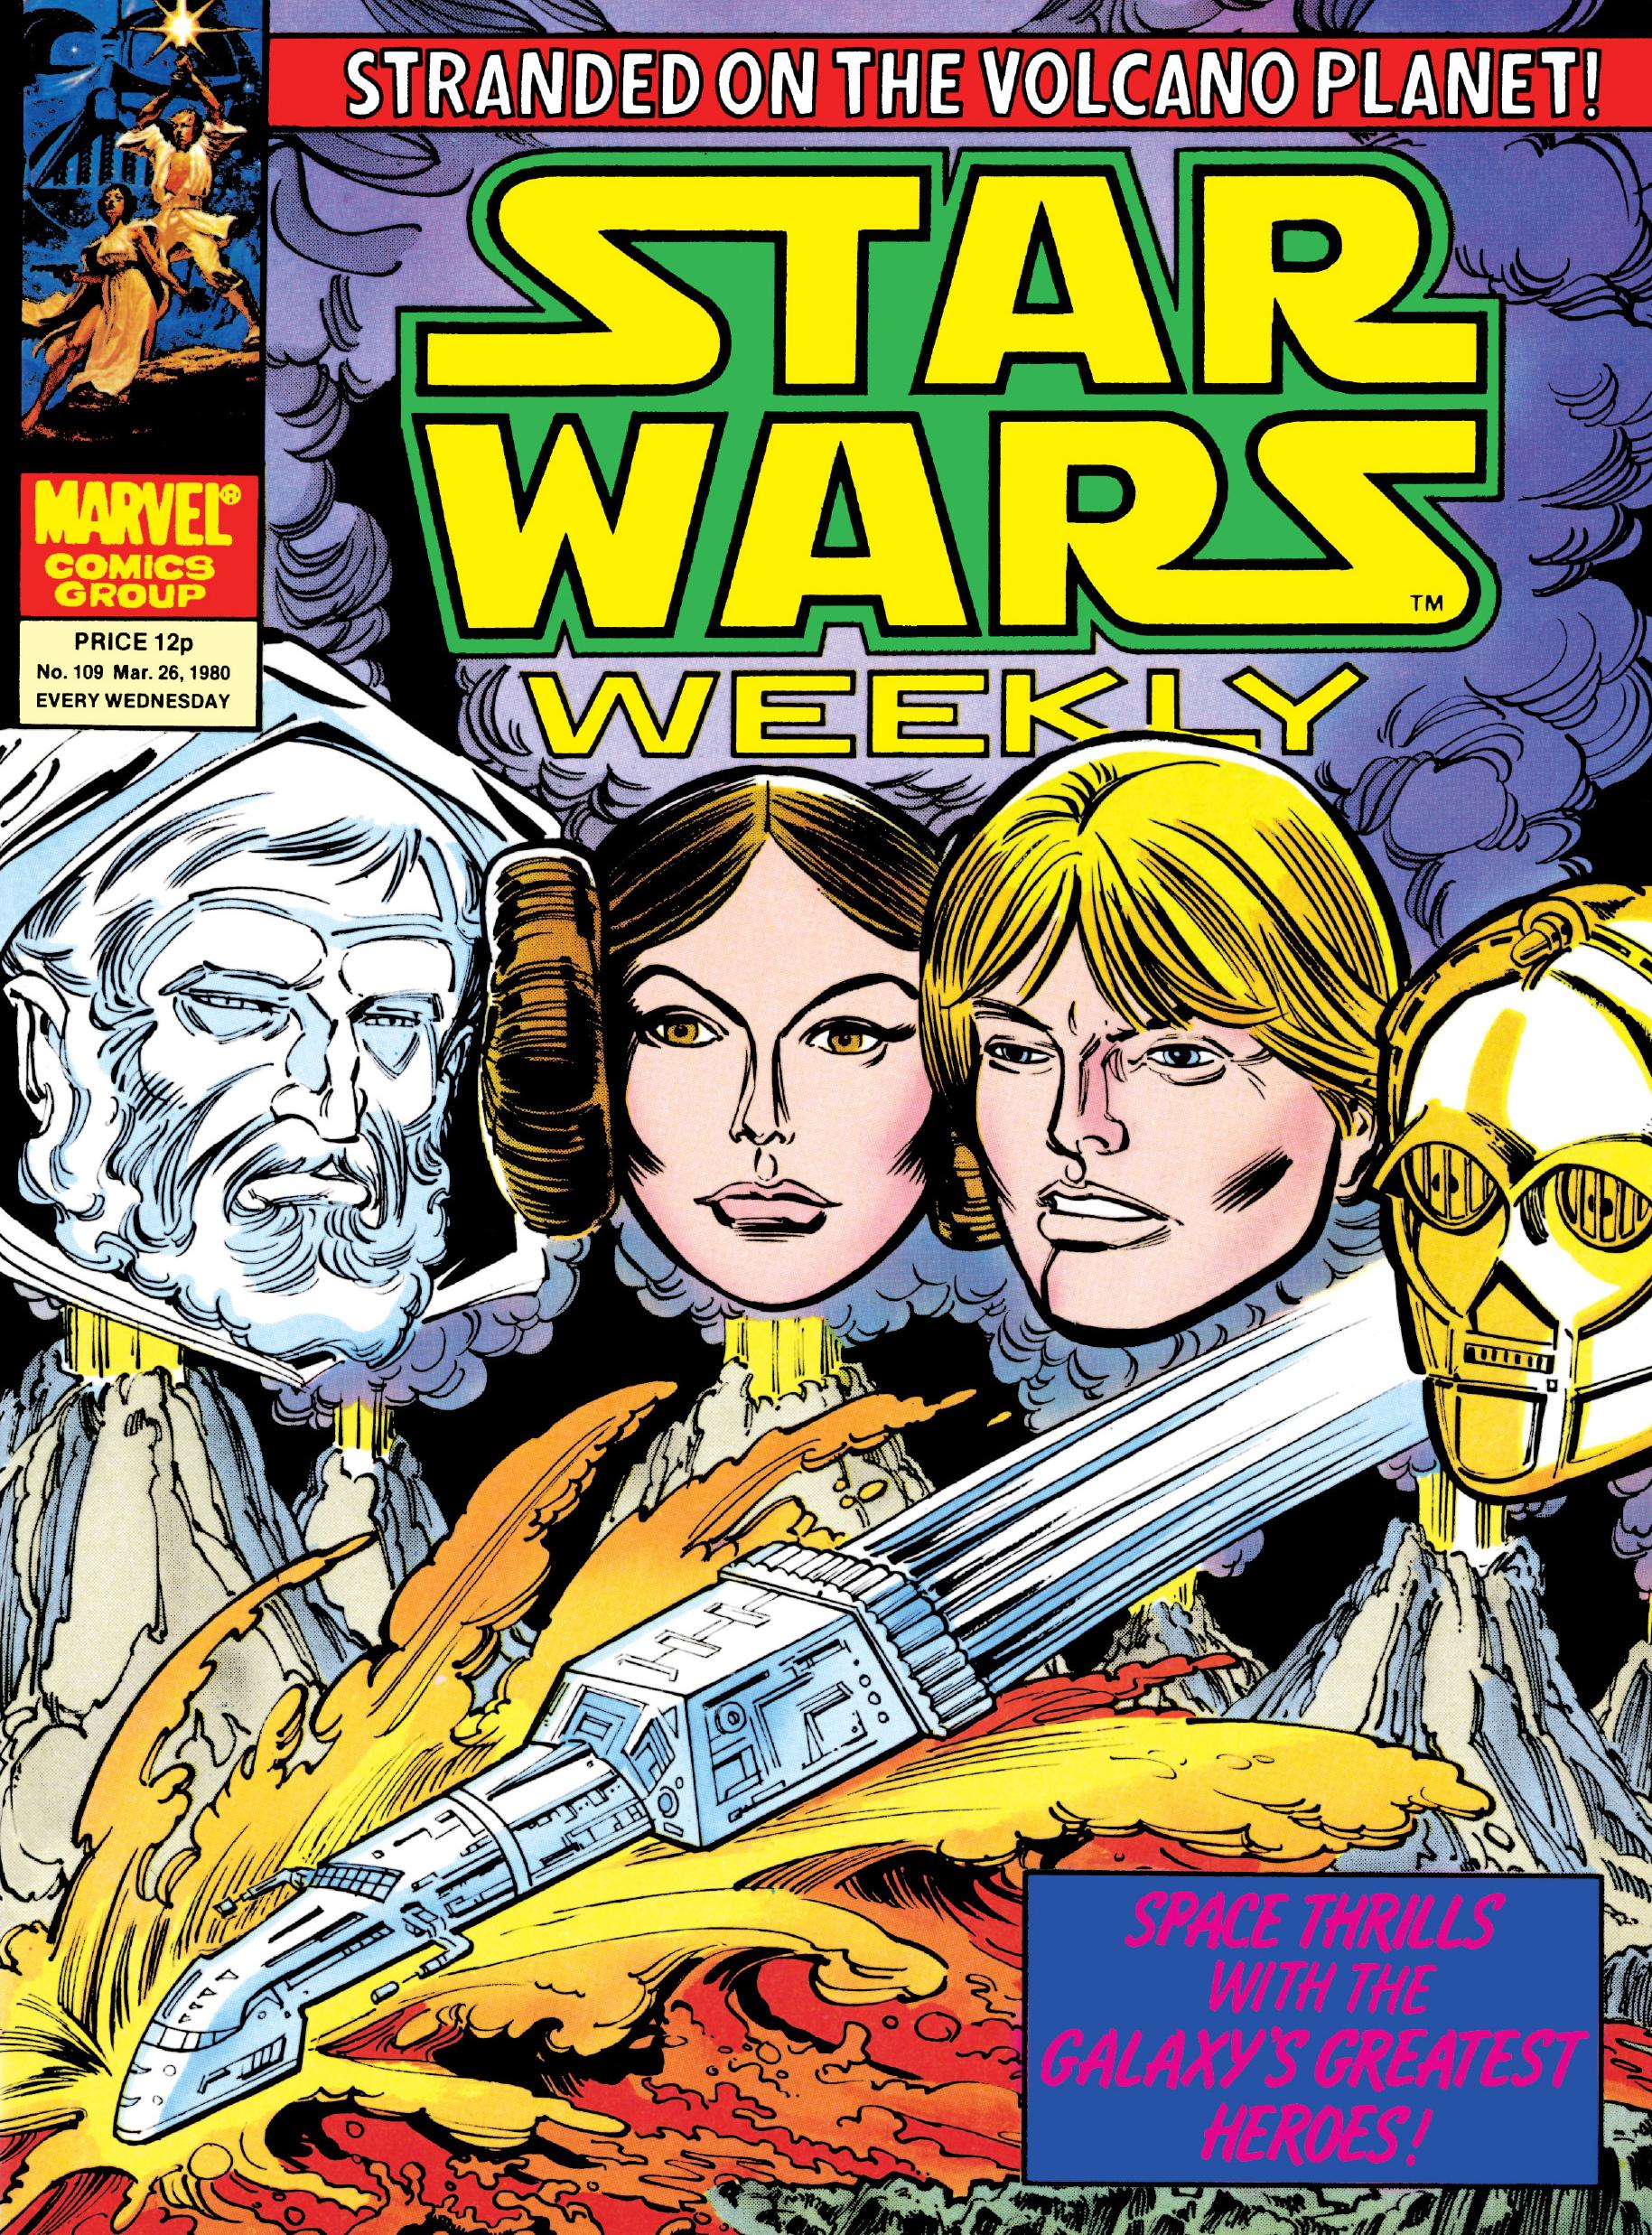 Star Wars Weekly 109